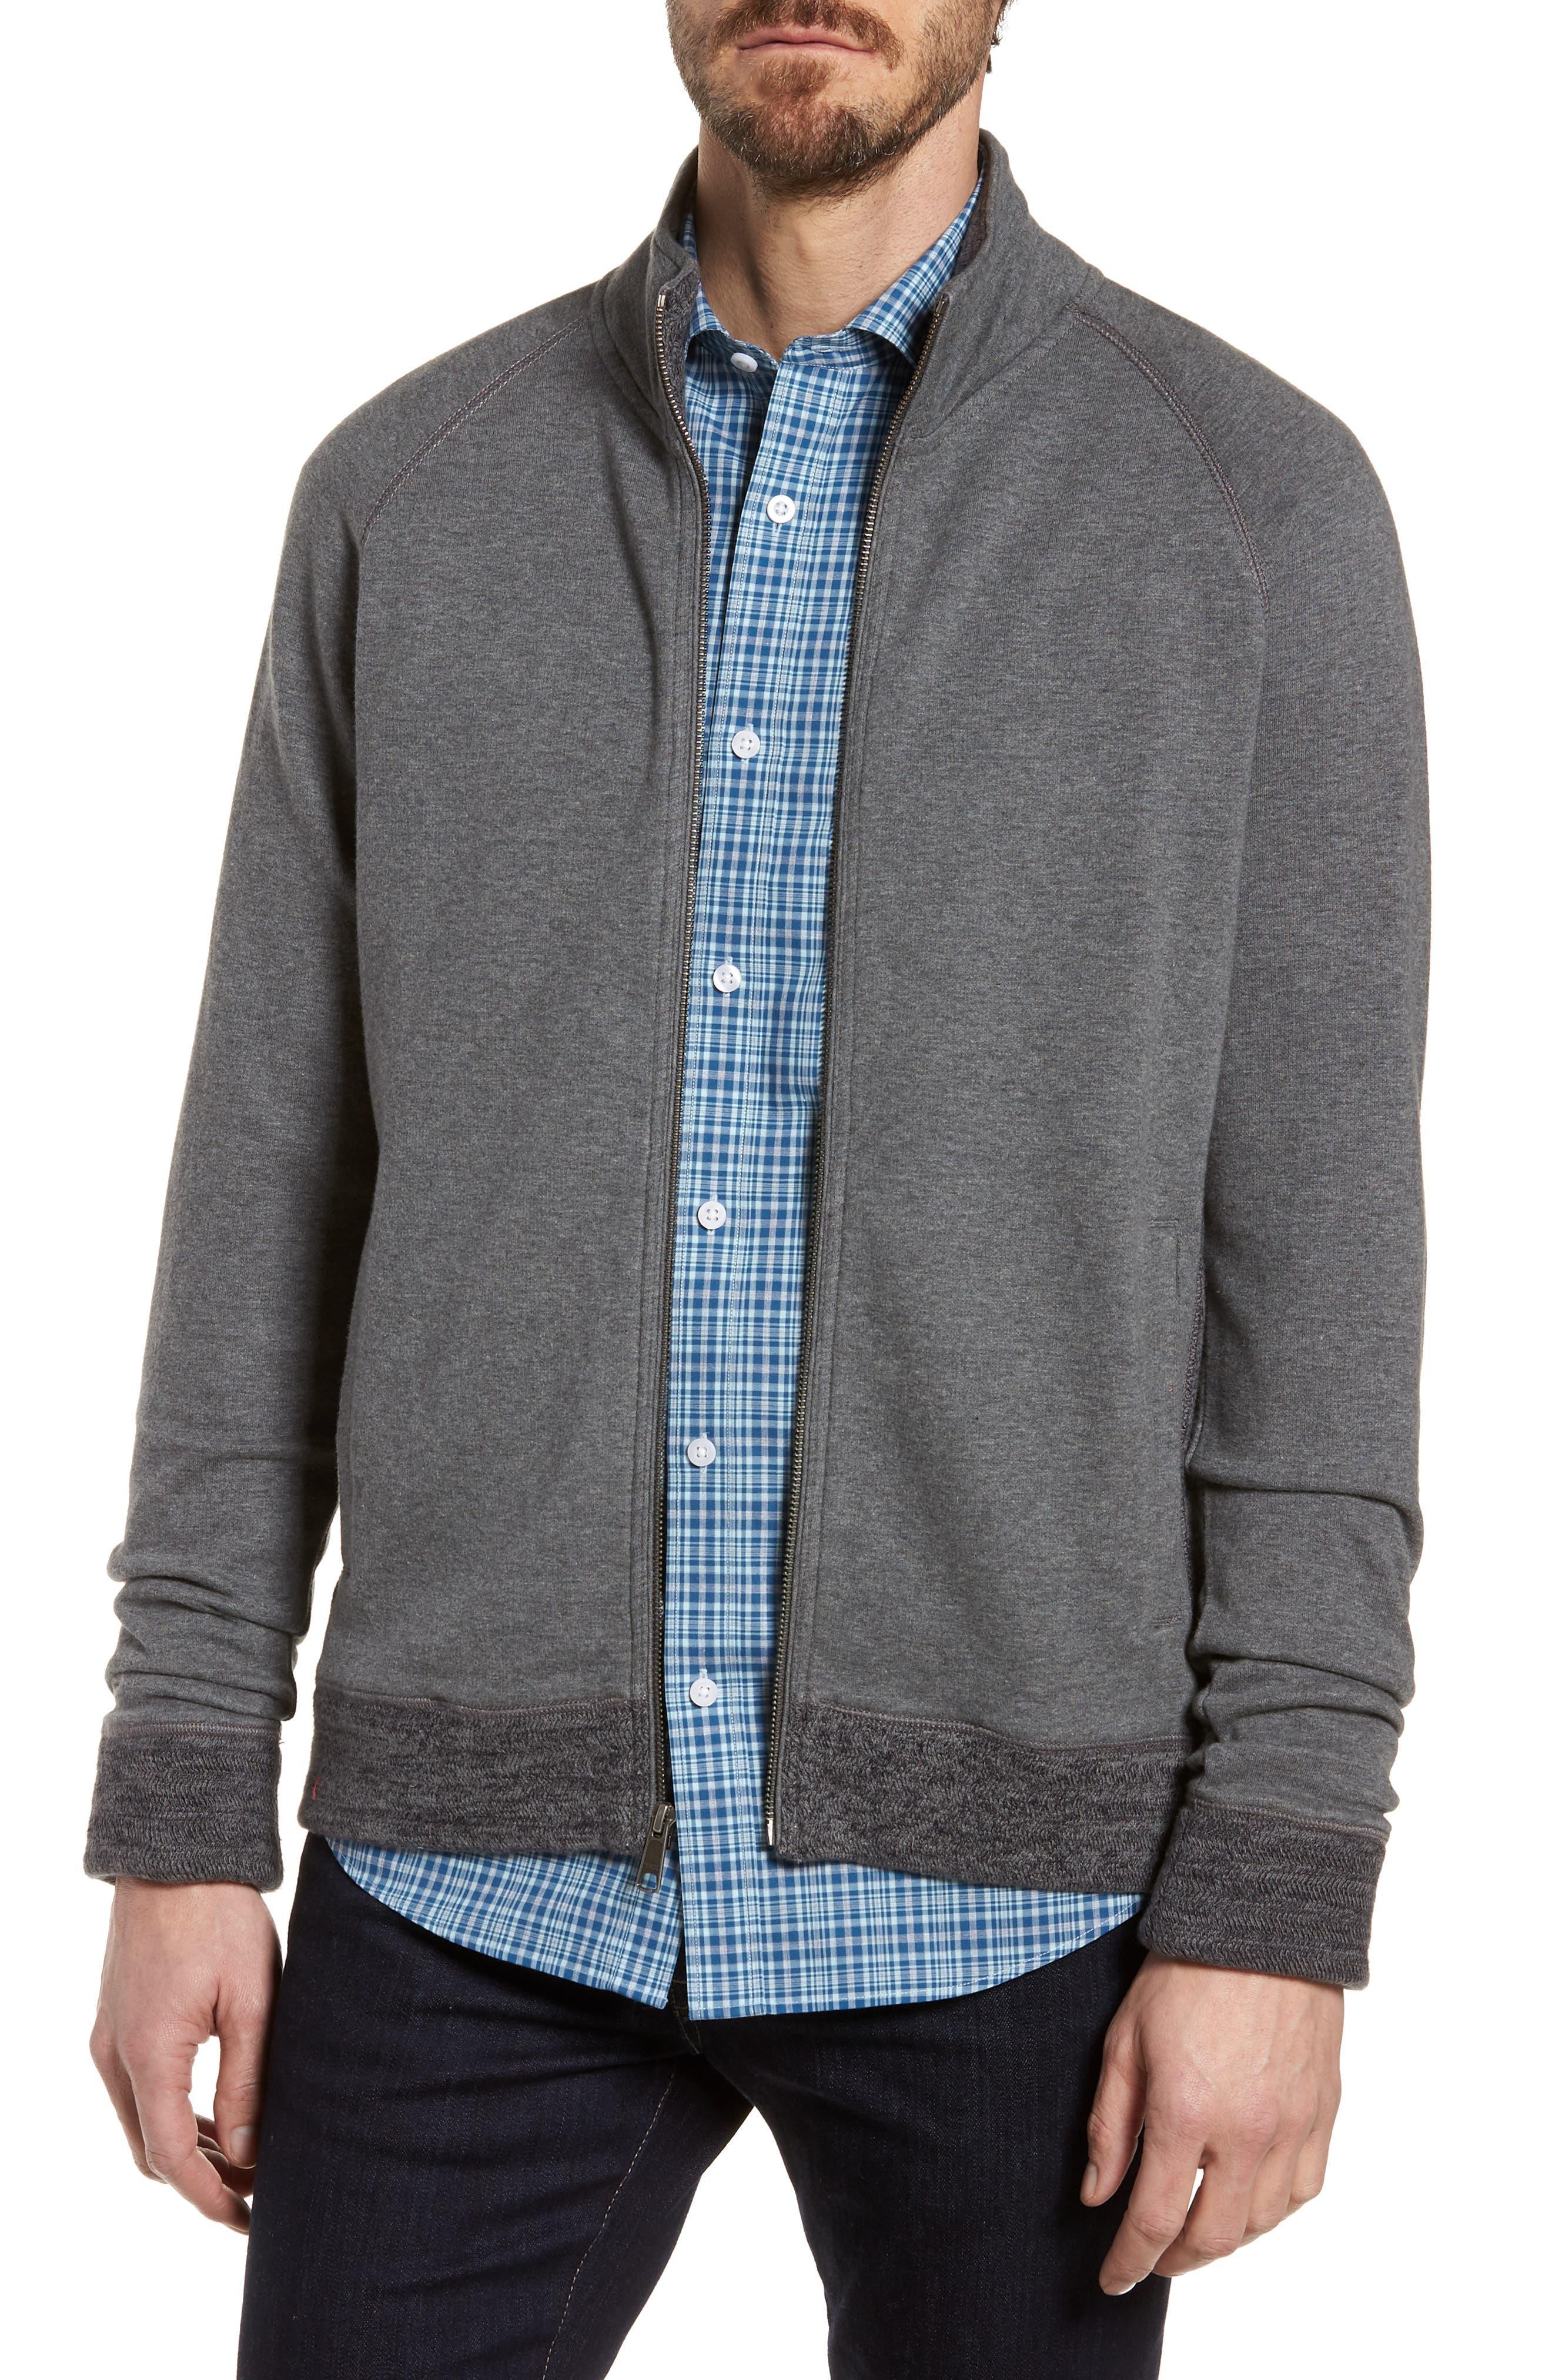 Full Zip Fleece Jacket,                         Main,                         color, Charcoal Heather